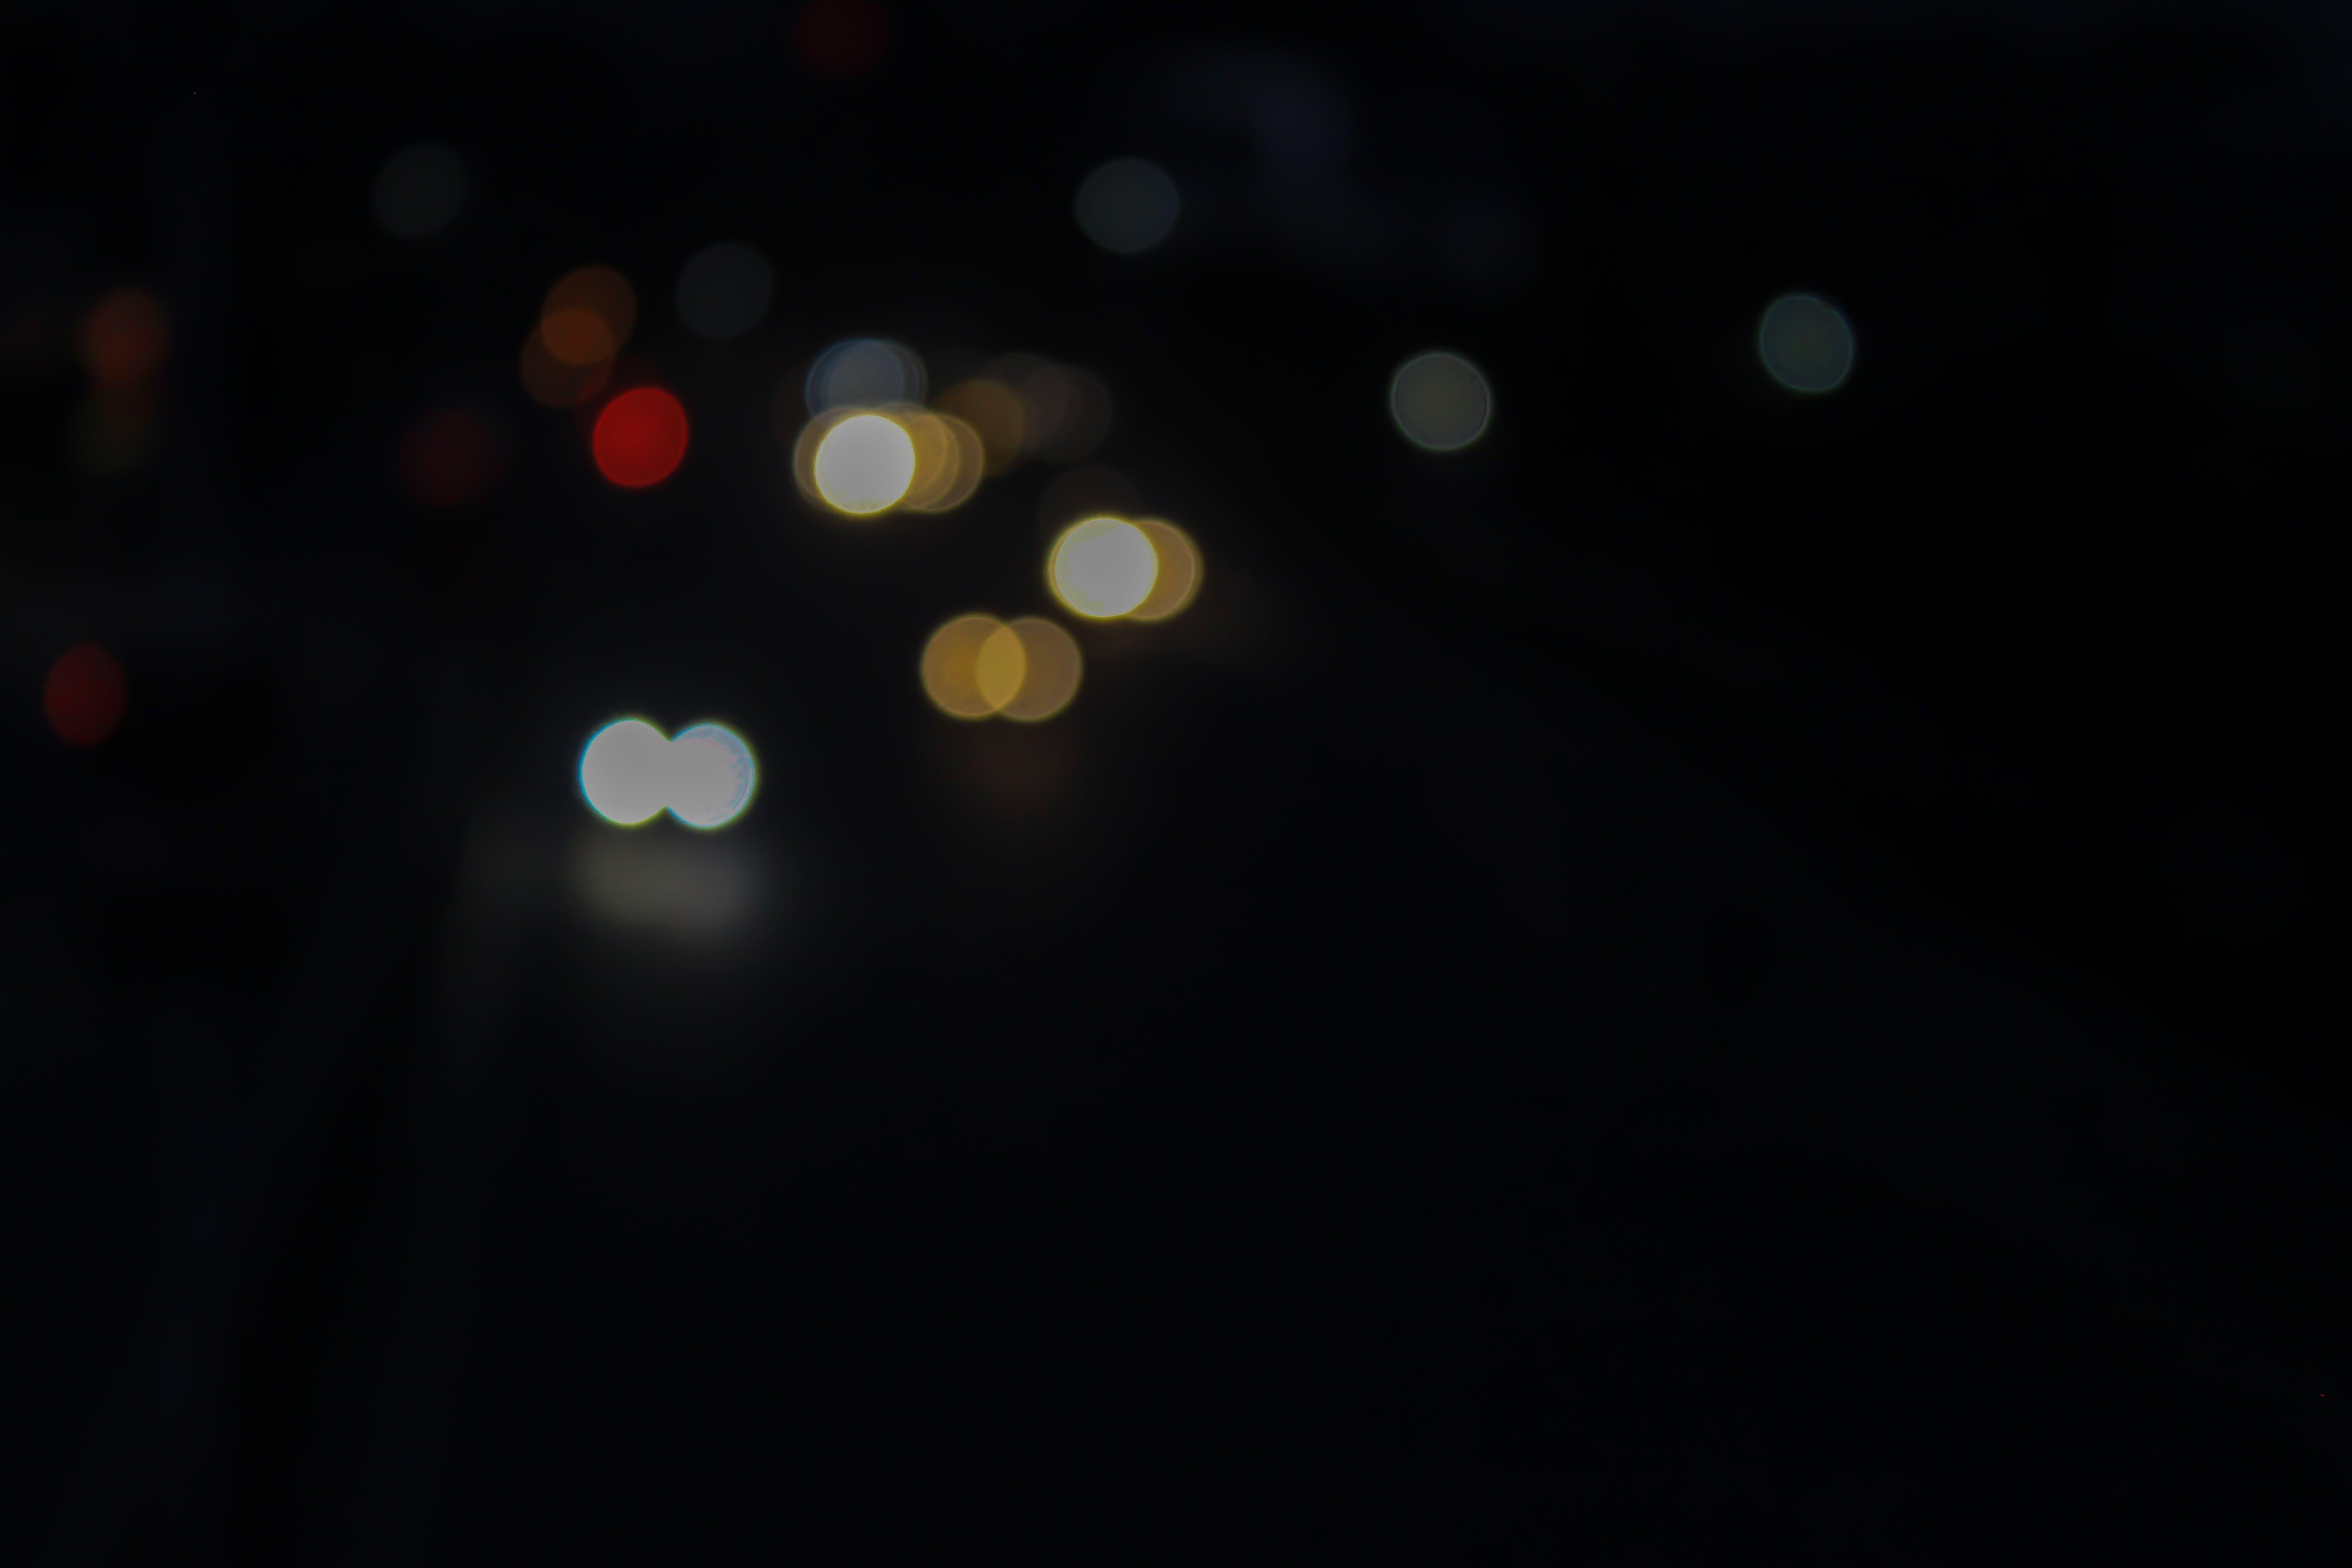 Free stock photo of bokeh, empty street, night city, night photography